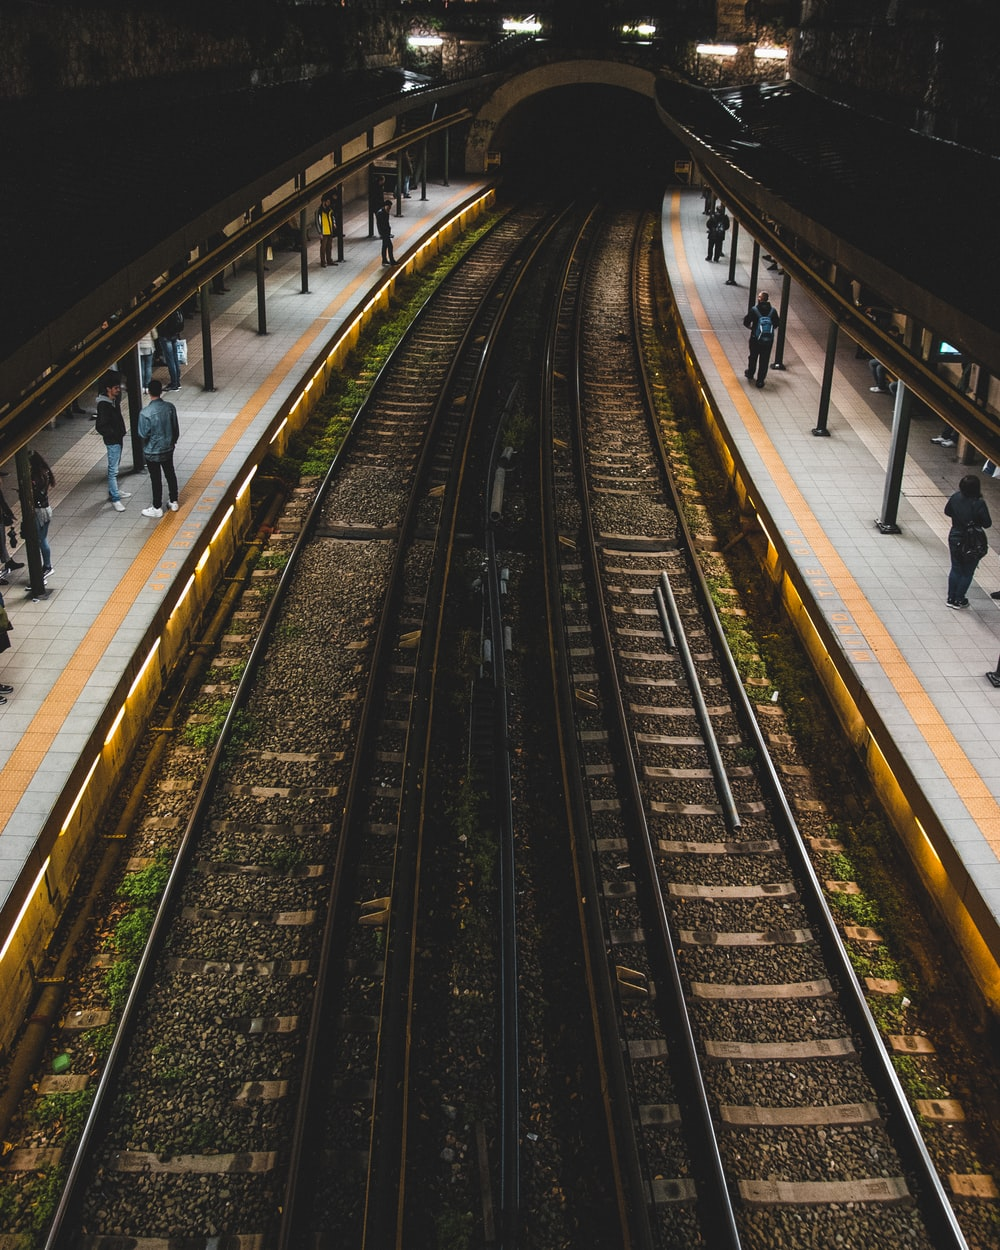 people standing beside train tracks